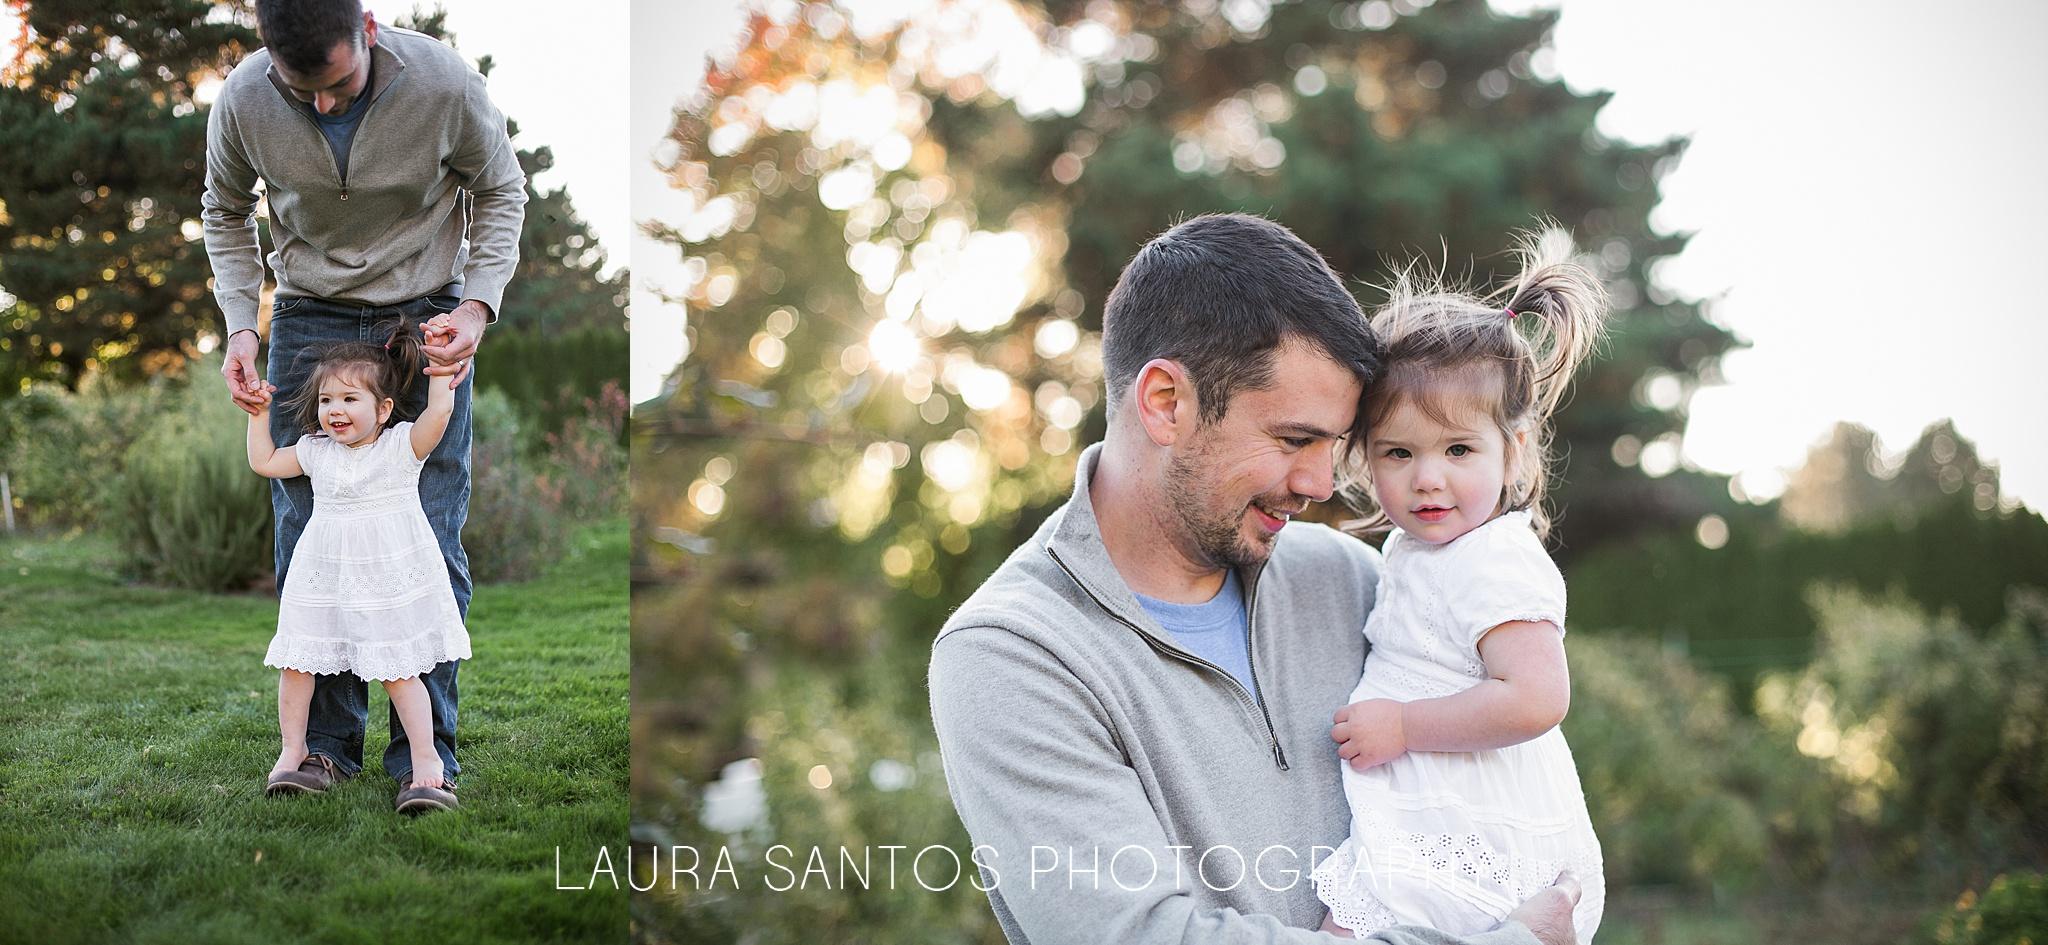 Laura Santos Photography Portland Oregon Family Photographer_0834.jpg